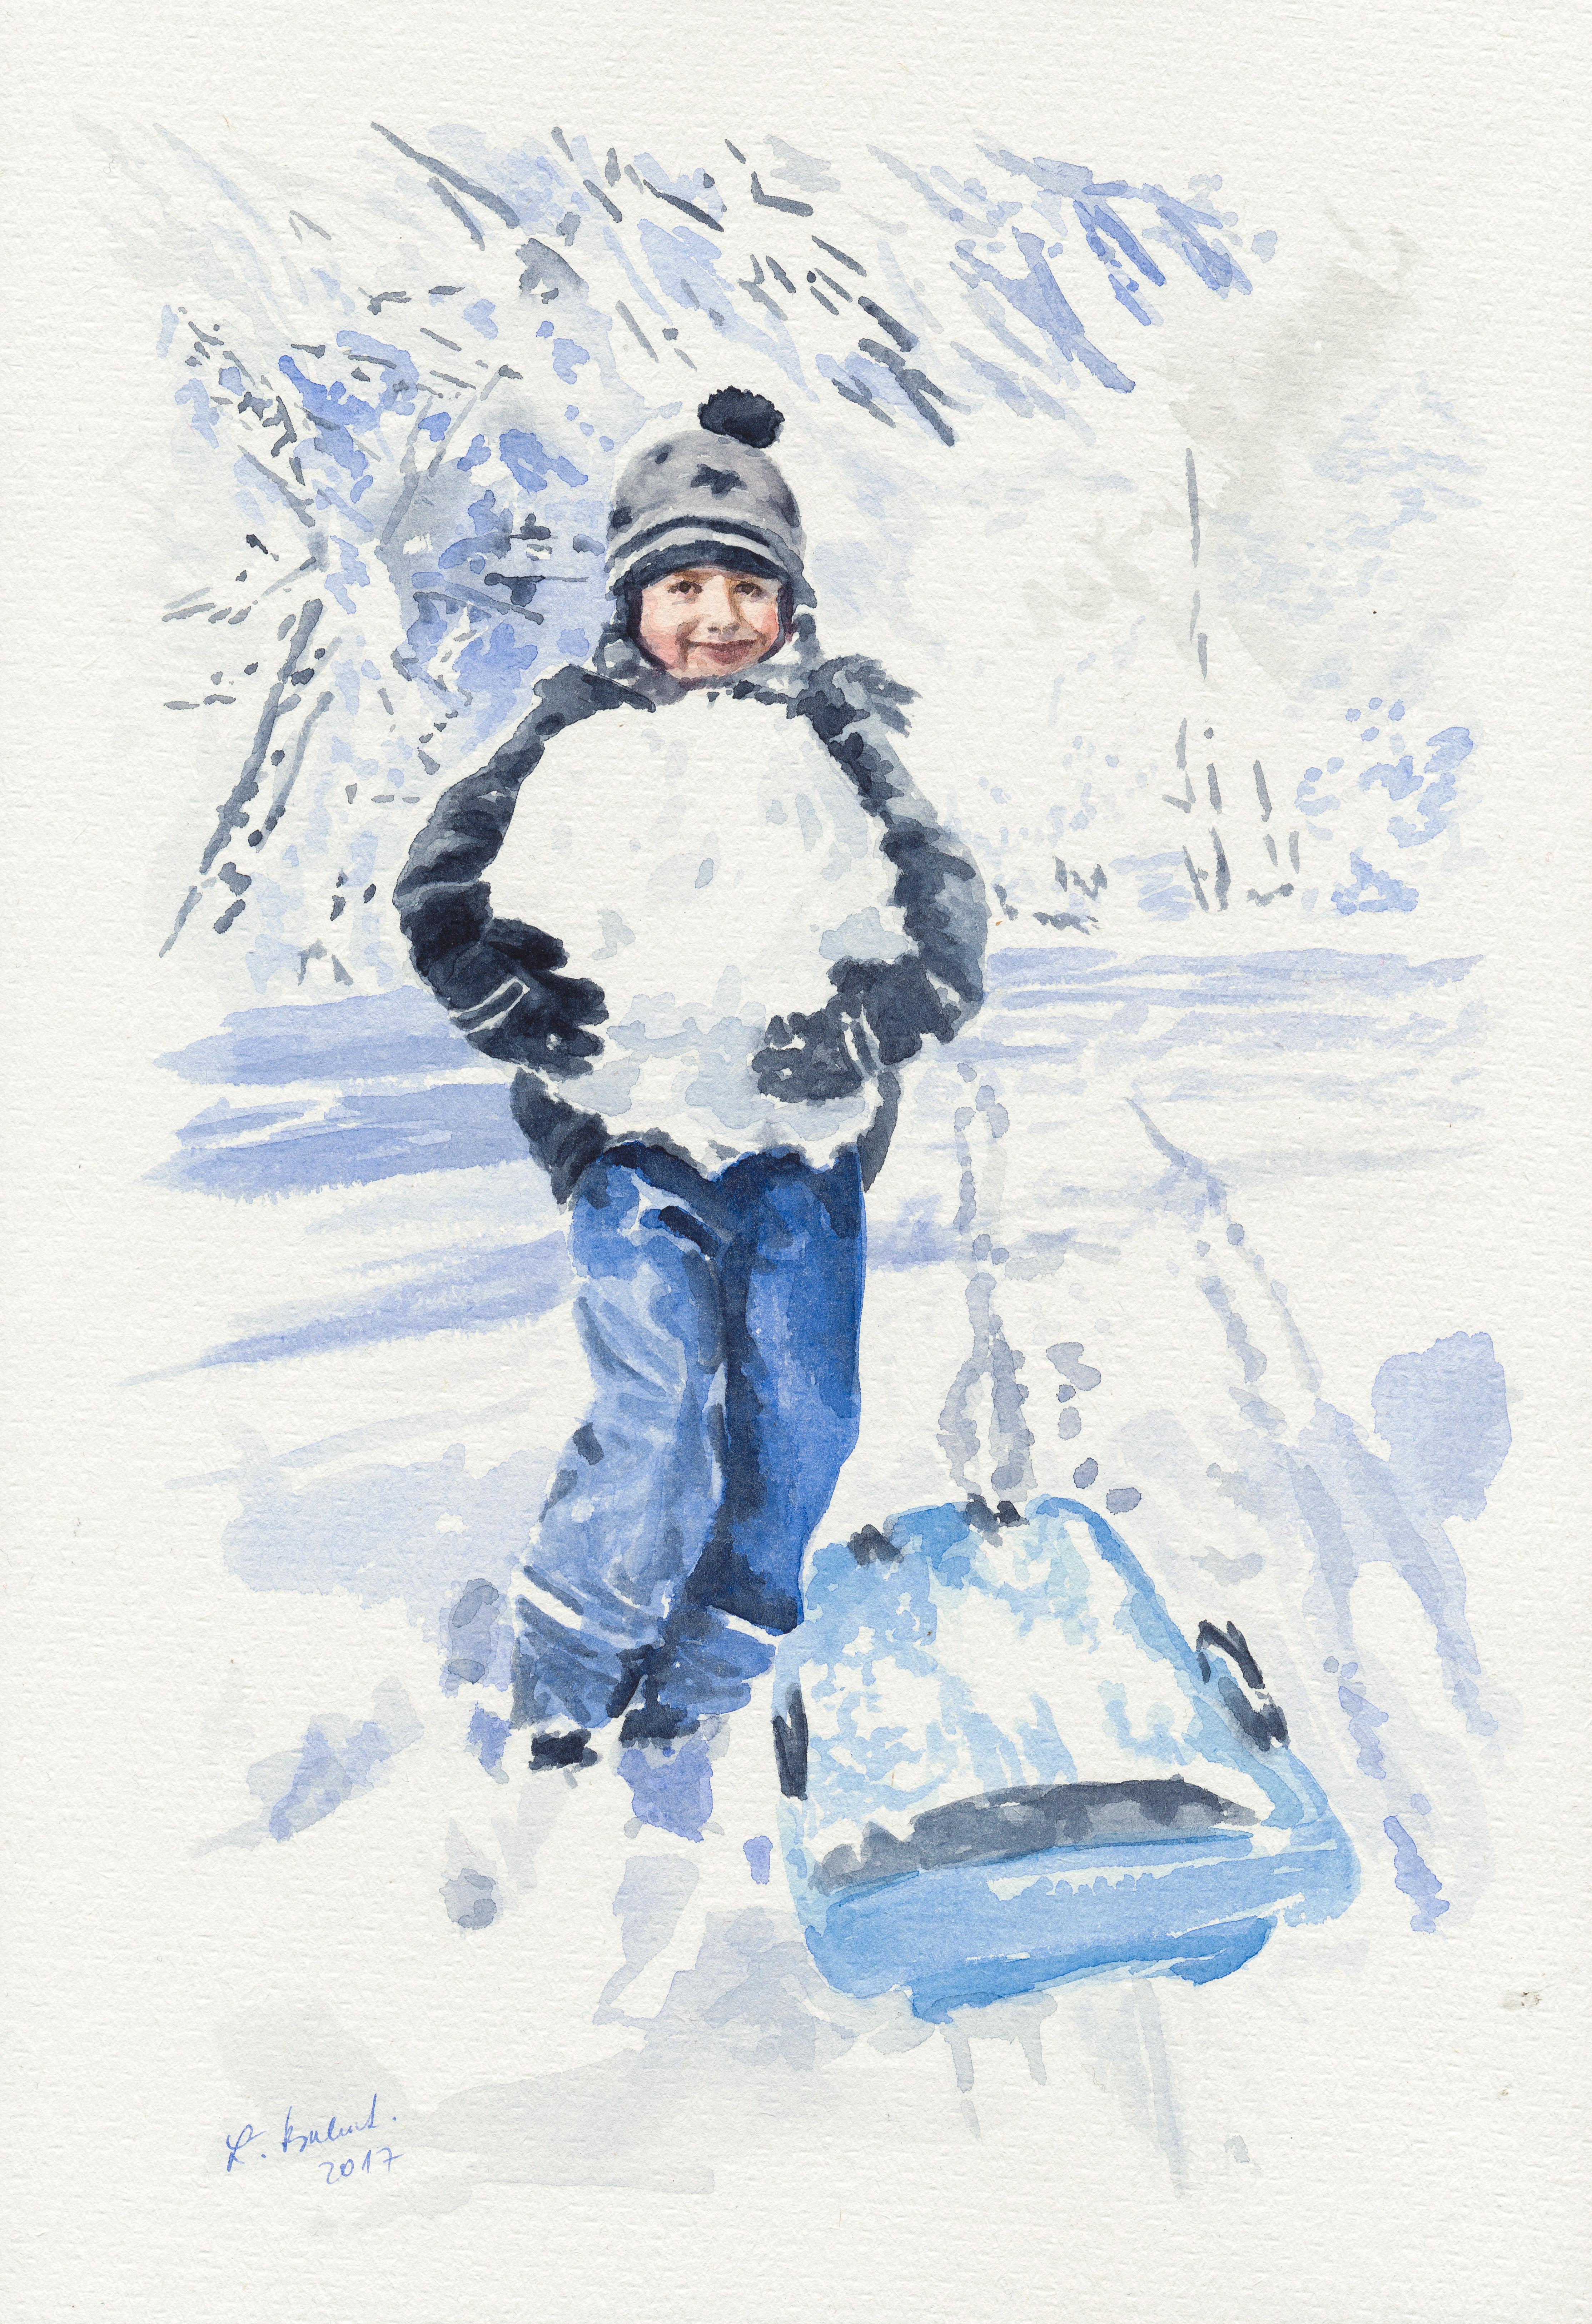 Chlapec so snehovou guľou – akvarelový obraz